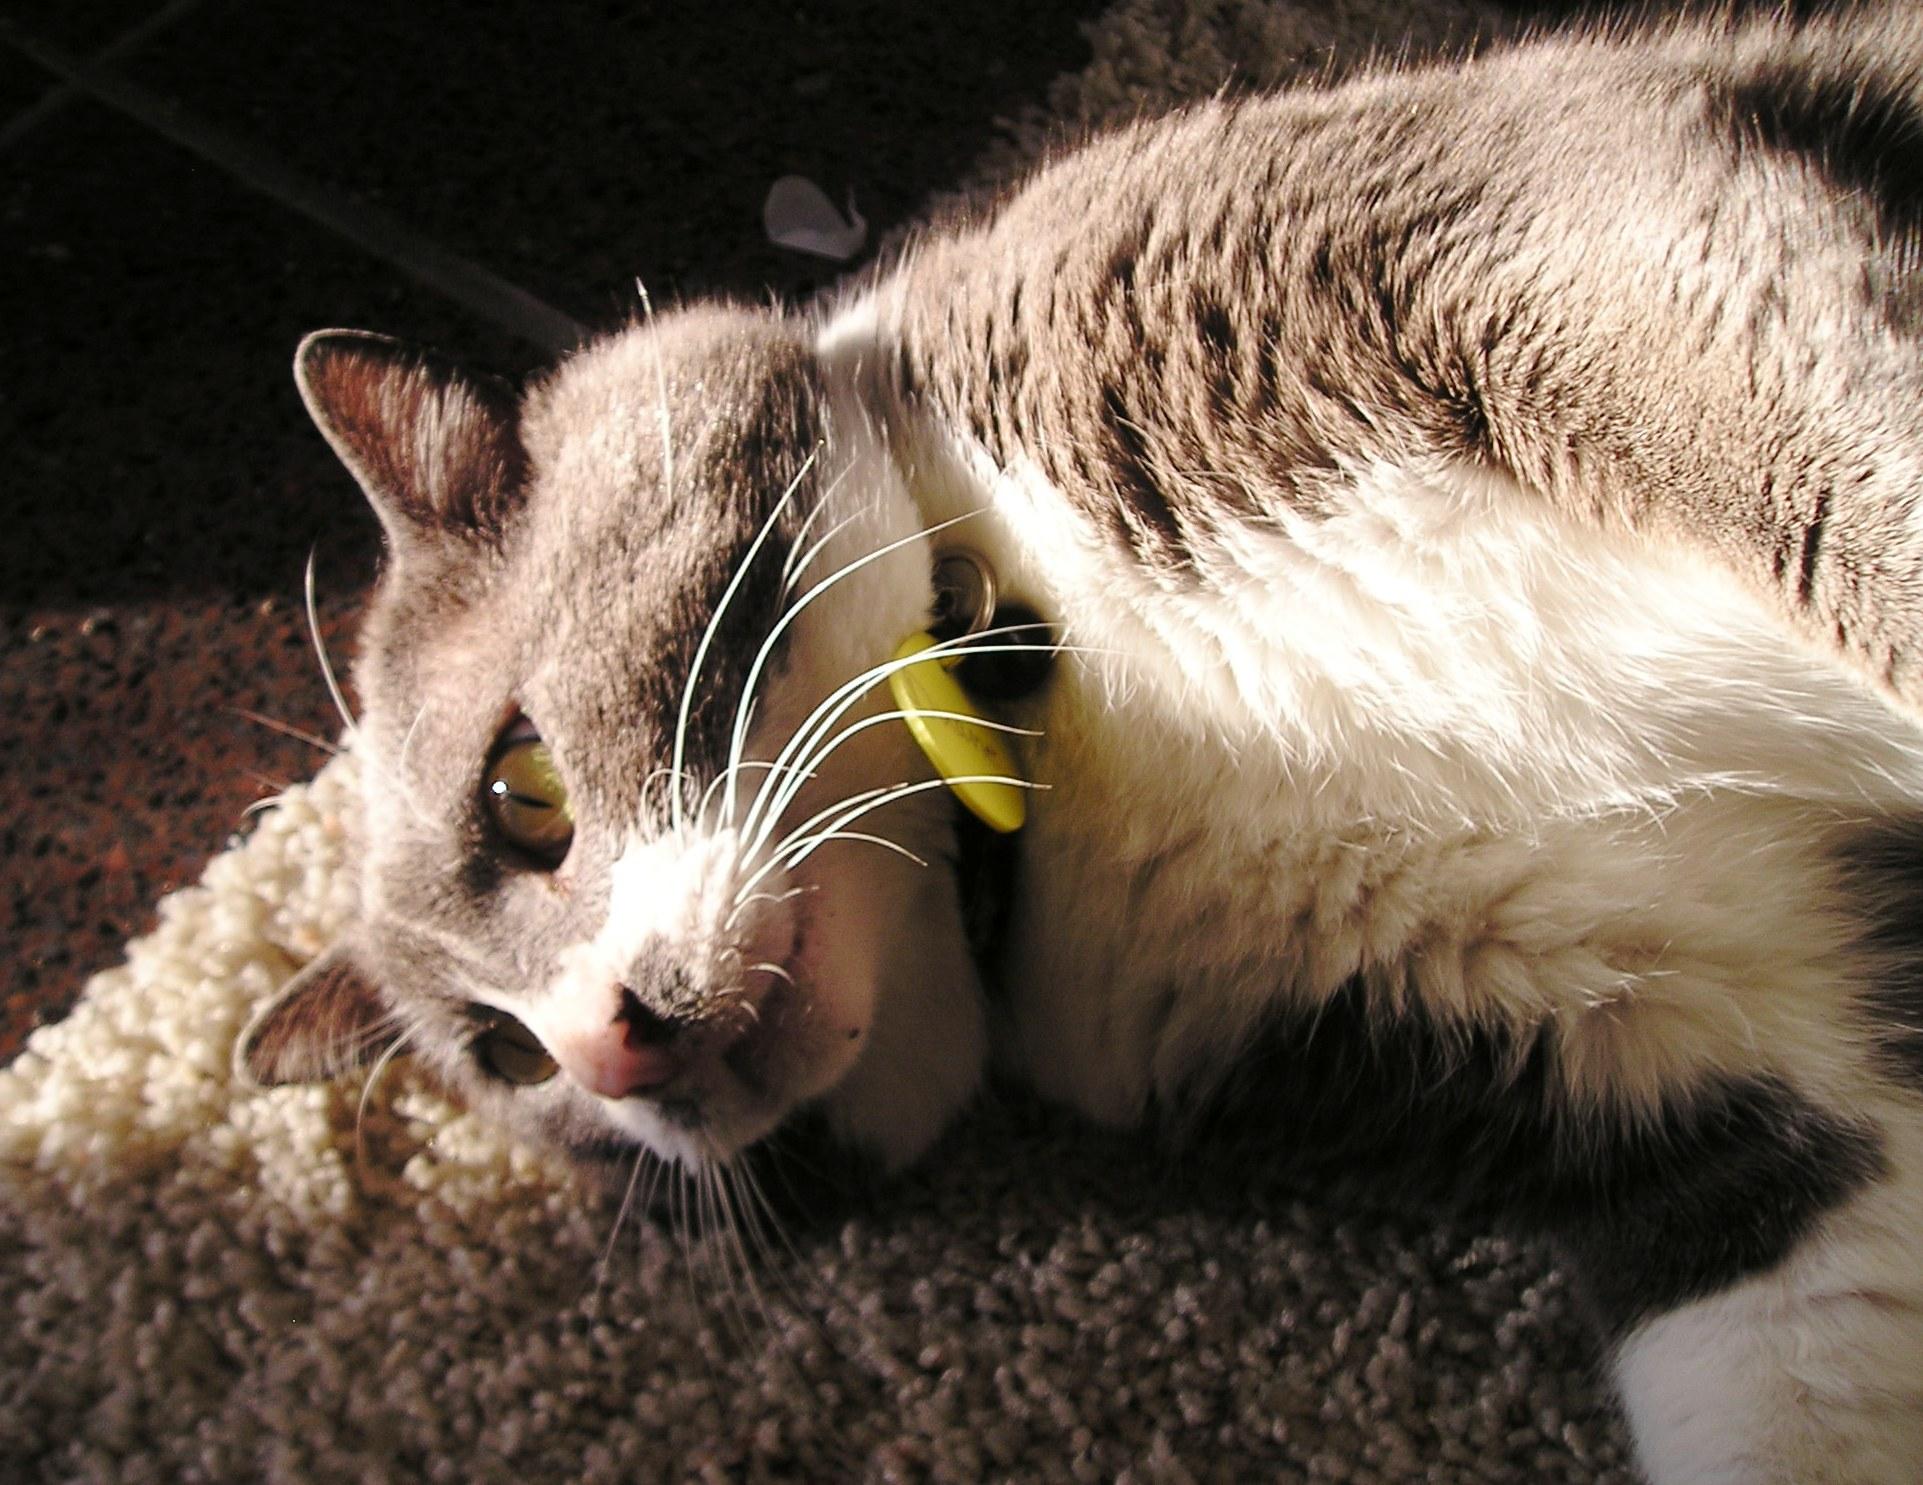 APA rescue cat, Duane